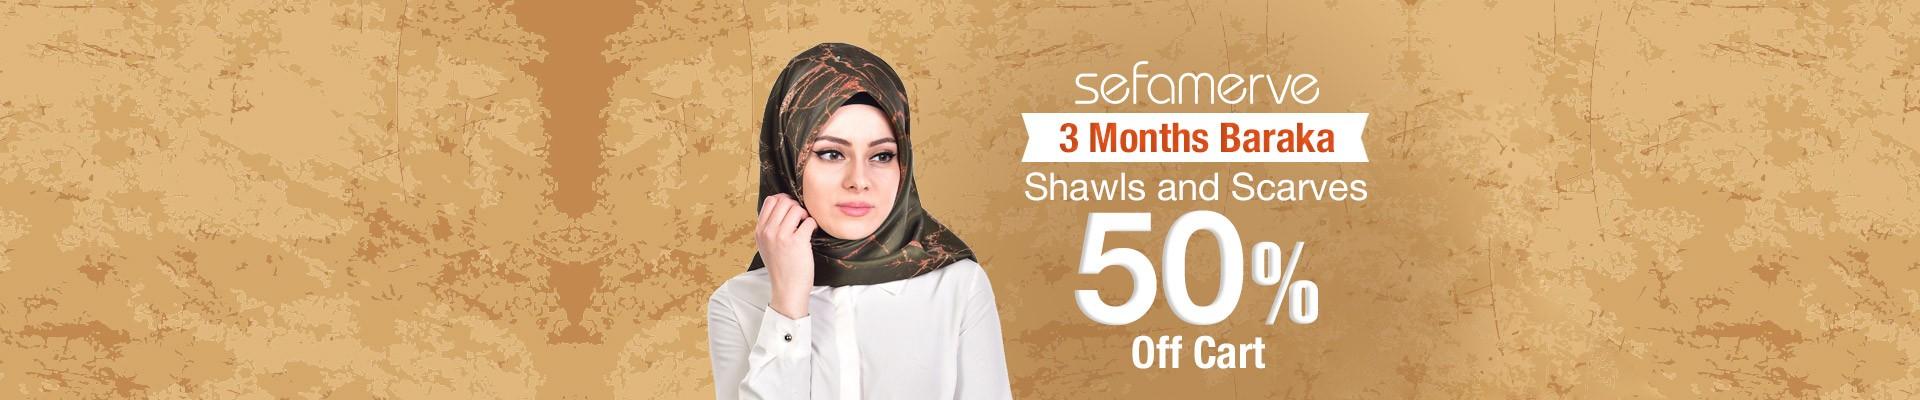 3 Months Baraka Shawls and Scarves 50% Off Cart